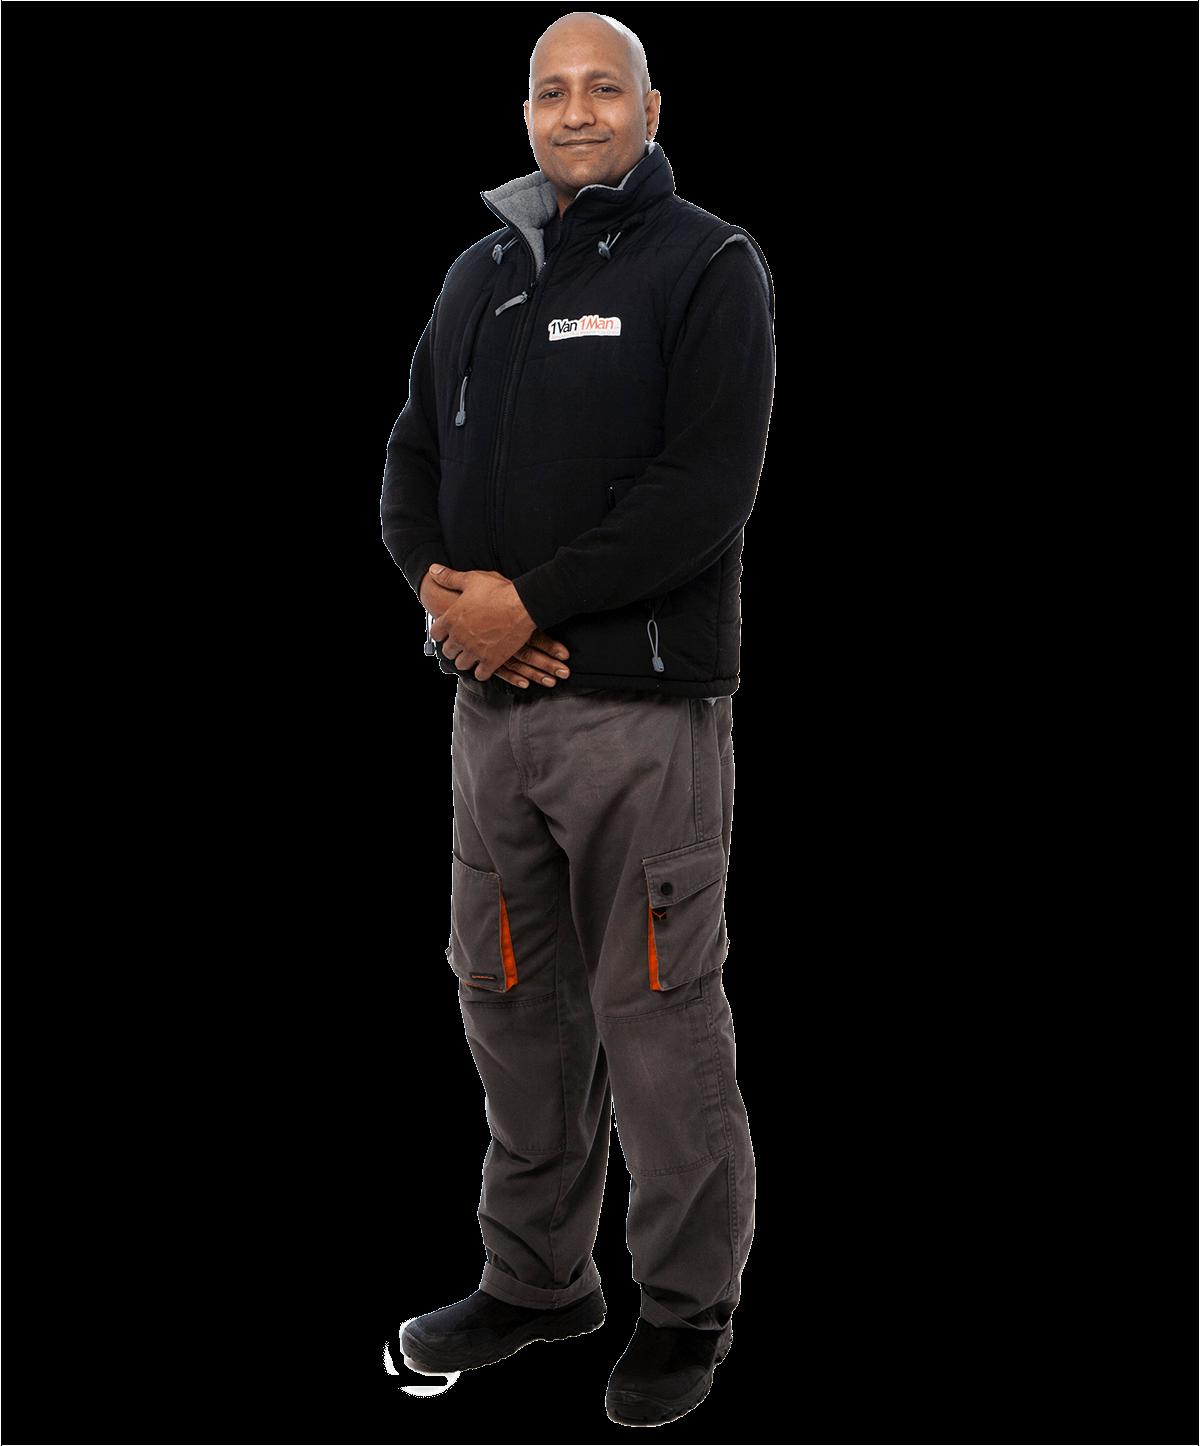 Dale Gosine in 1 Van 1 Man Uniform